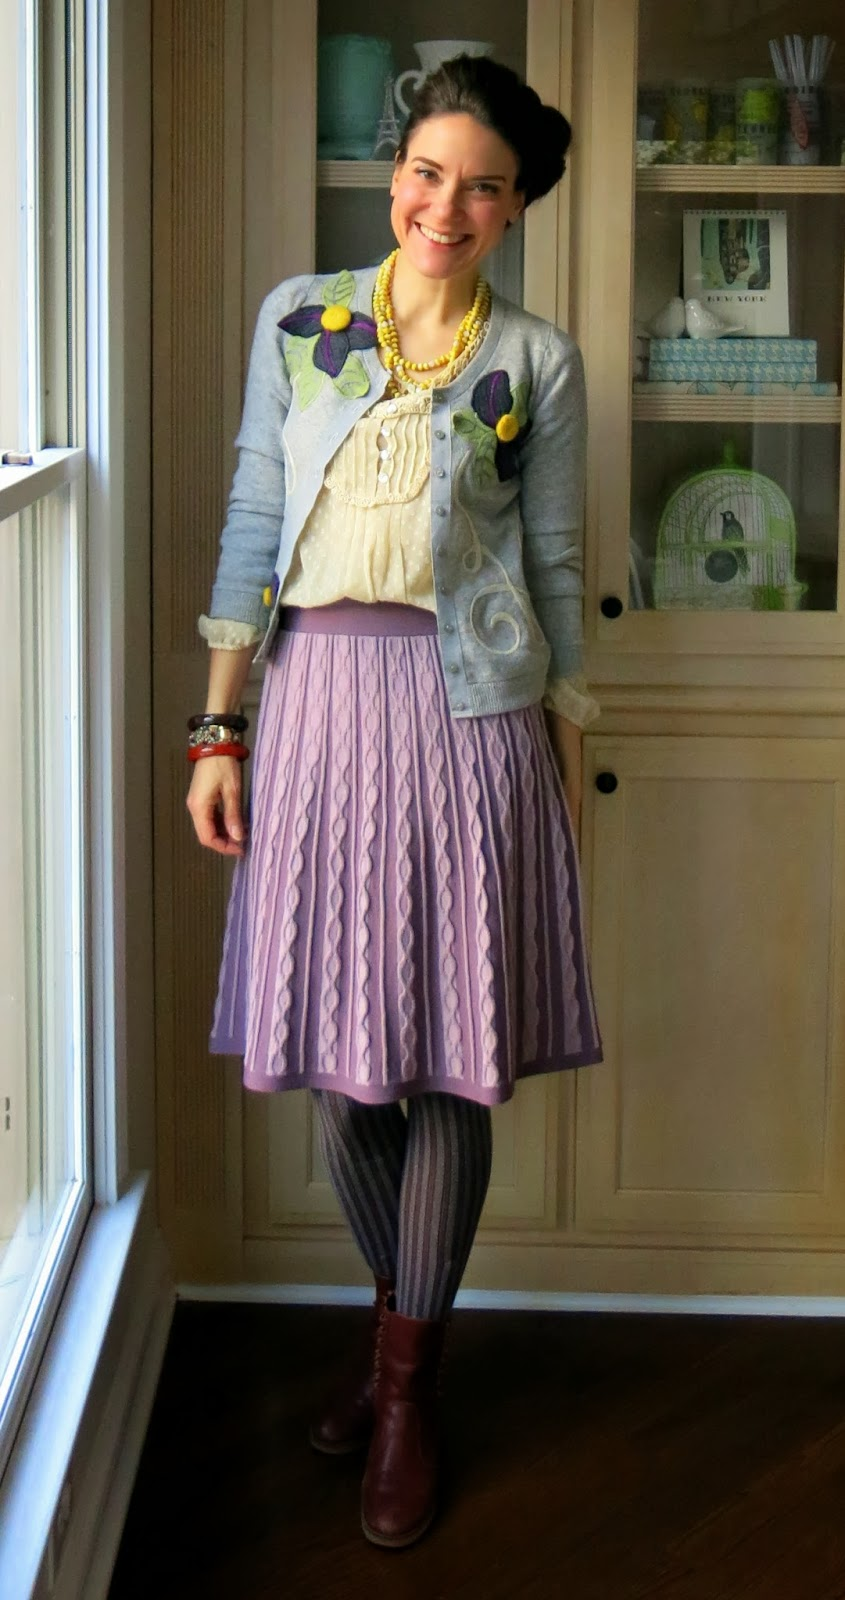 Cassie Stephens: art teacher clothes